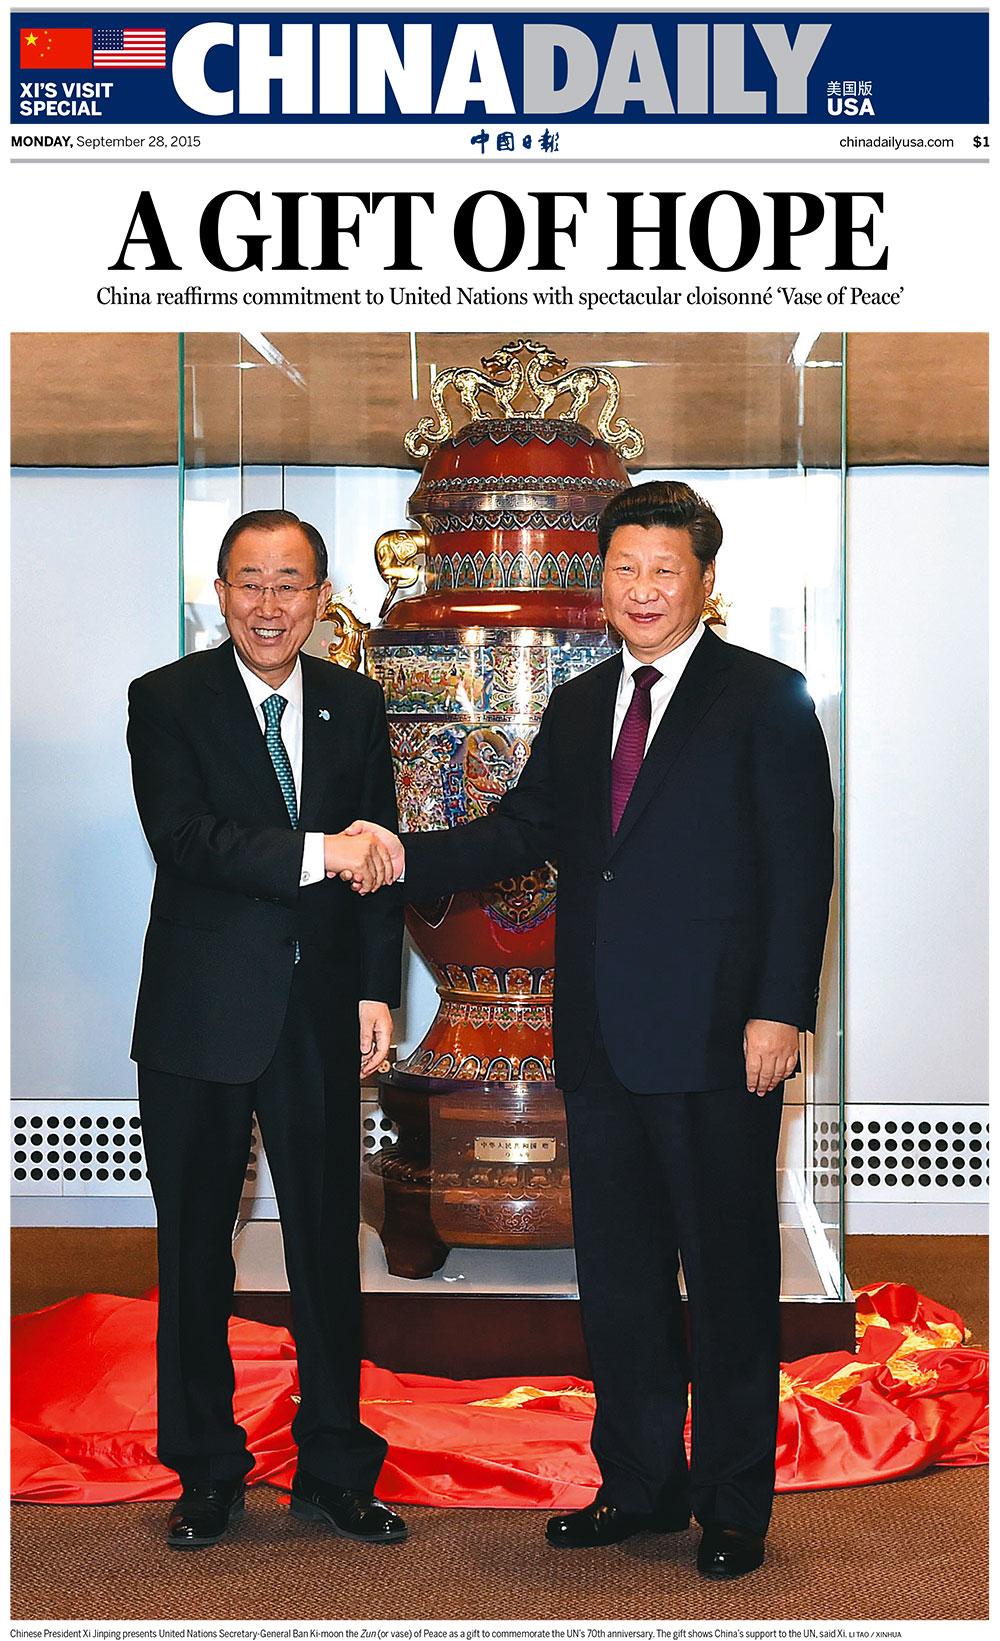 'China Daily,' U.S. Edition, September 28, 2015.